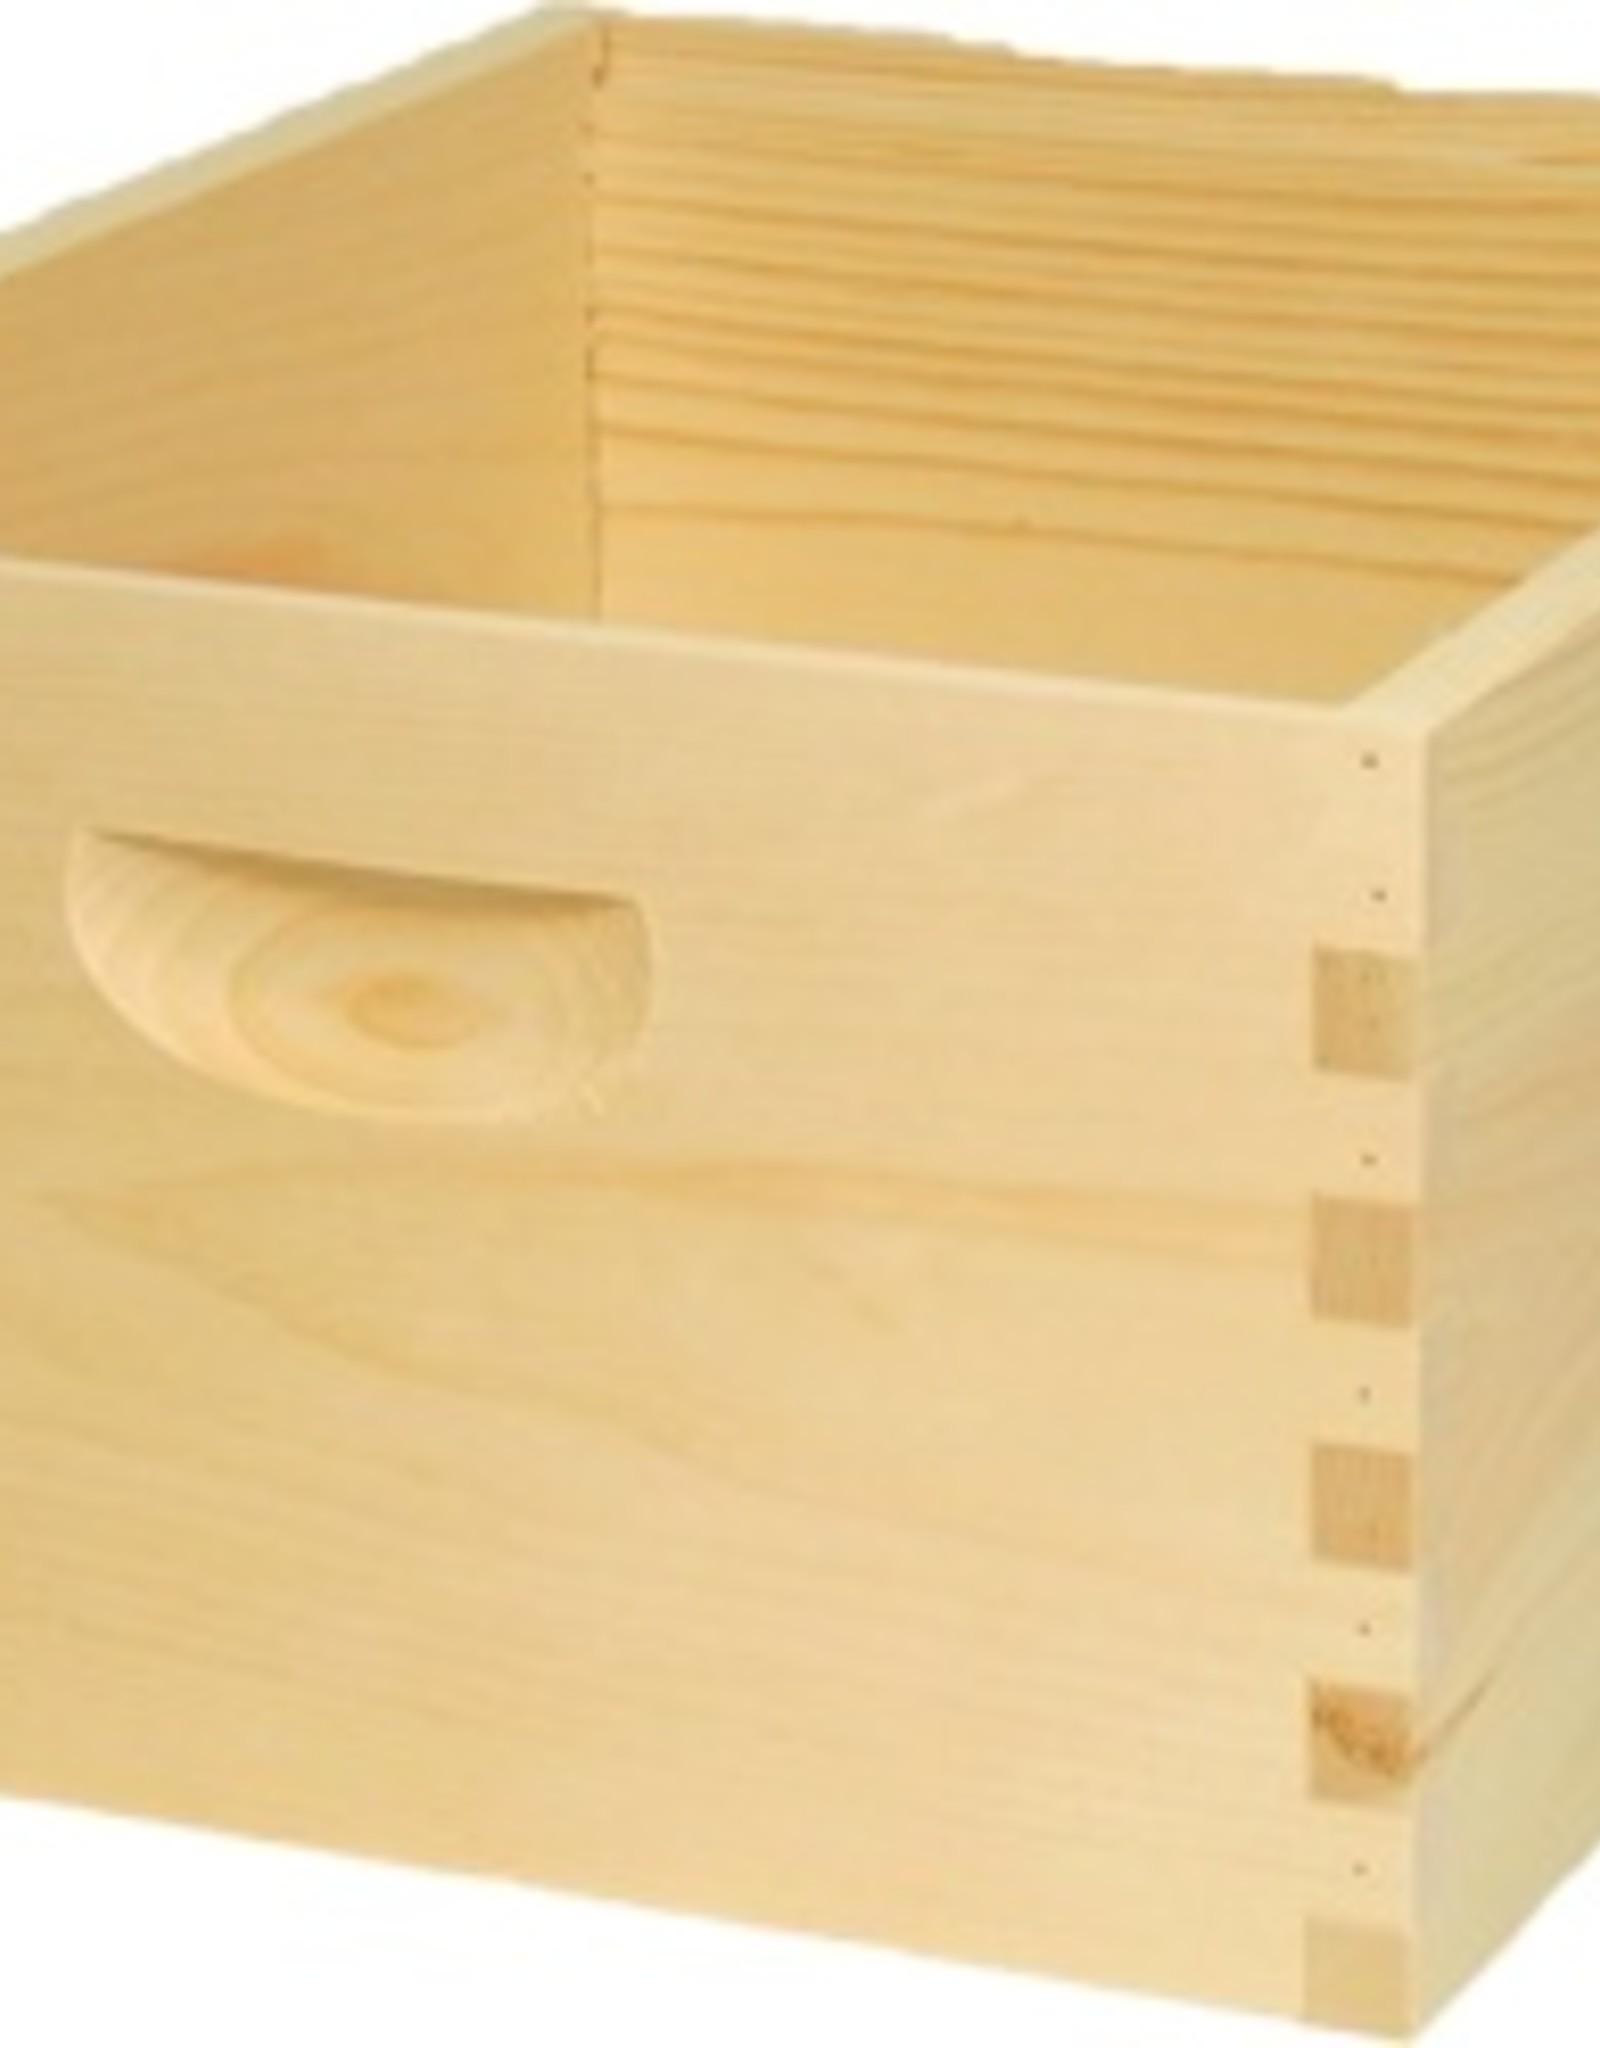 *10-Frame Deep Hive Body, Assembled